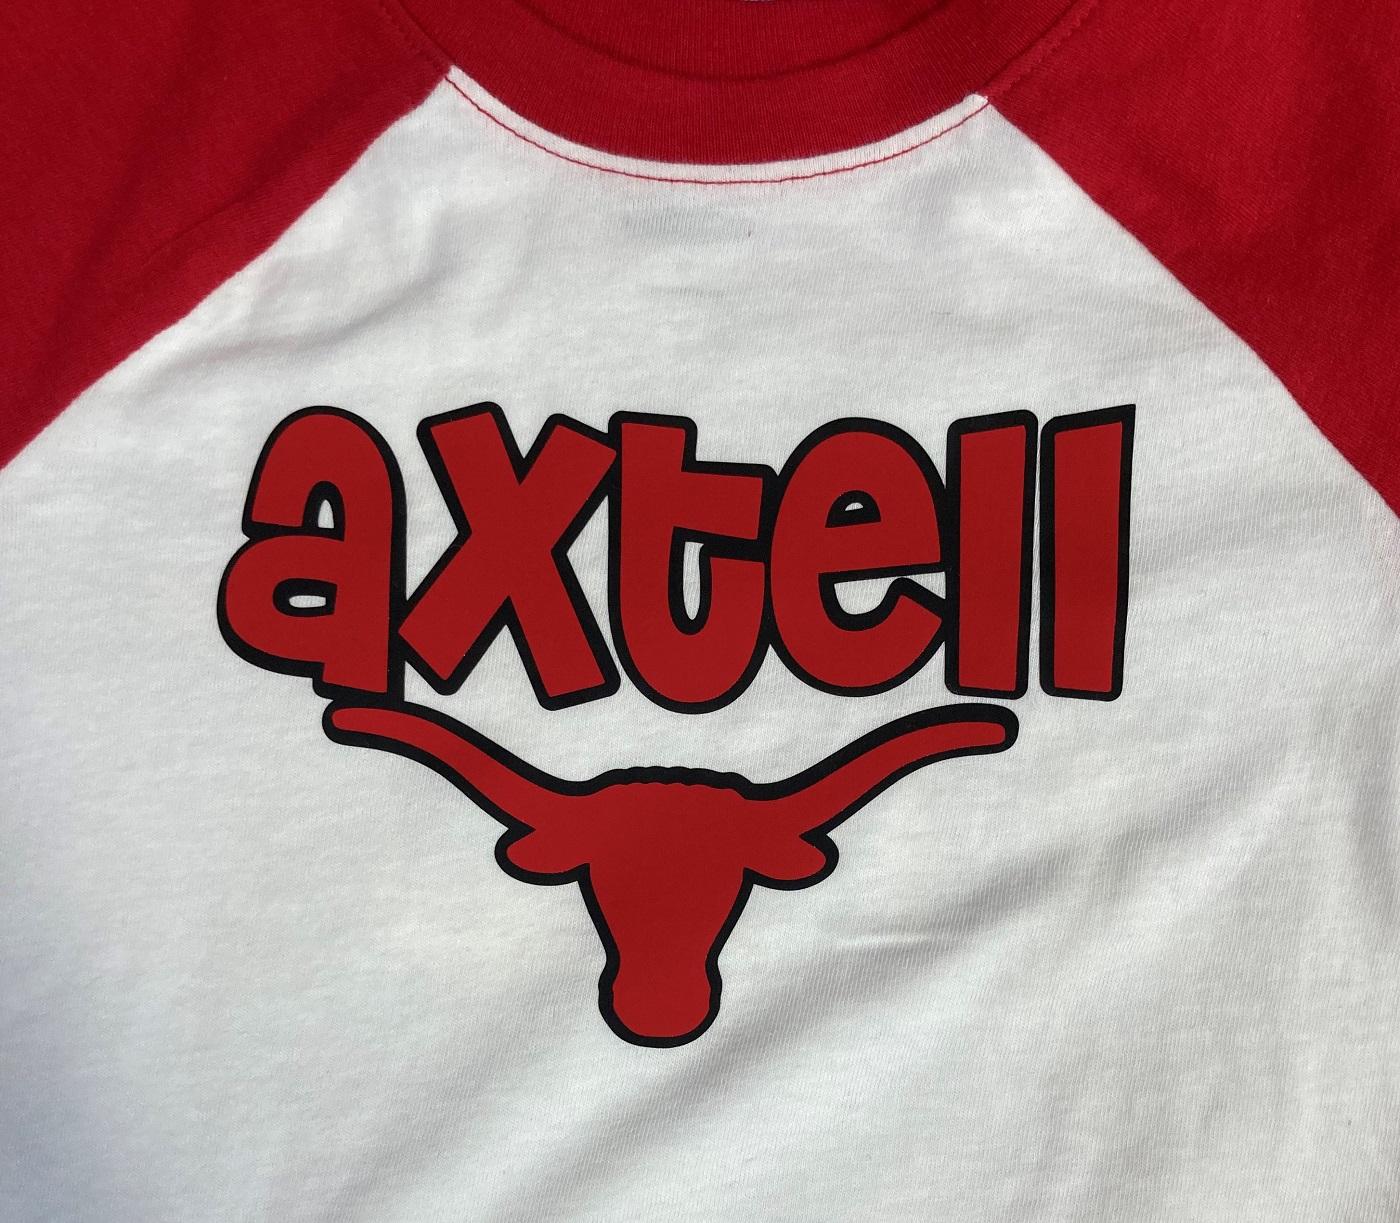 Little Axtell